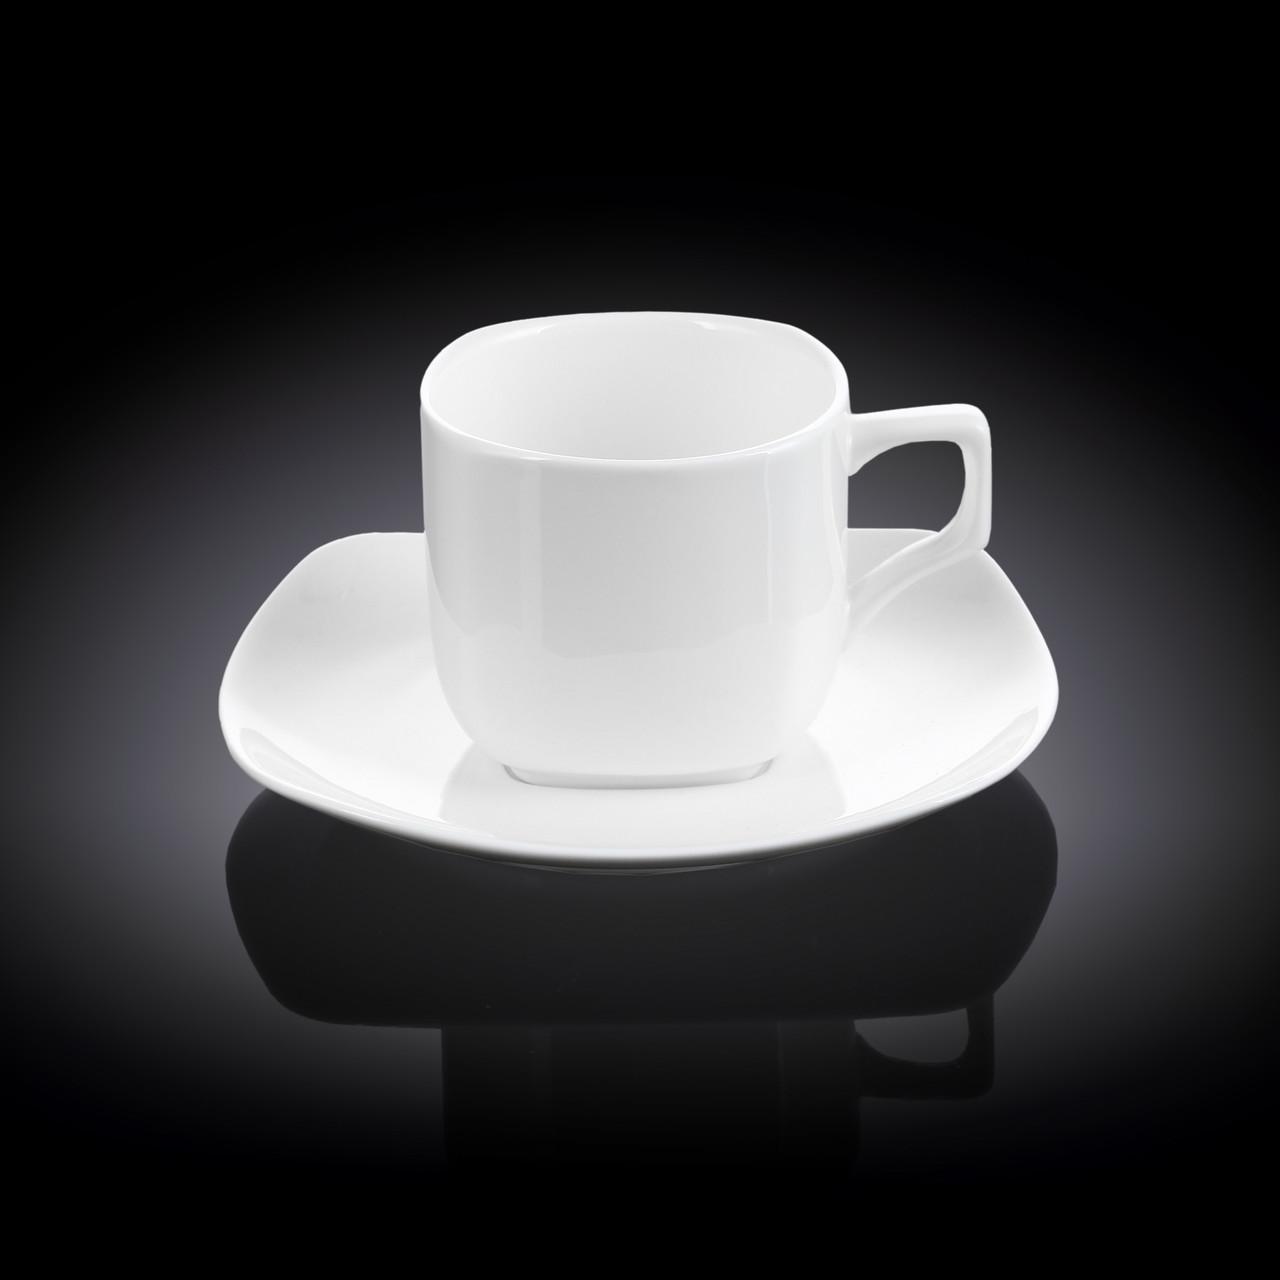 Набор чайная чашка и блюдце Wilmax 200 мл 6 пар (фирменная коробка)